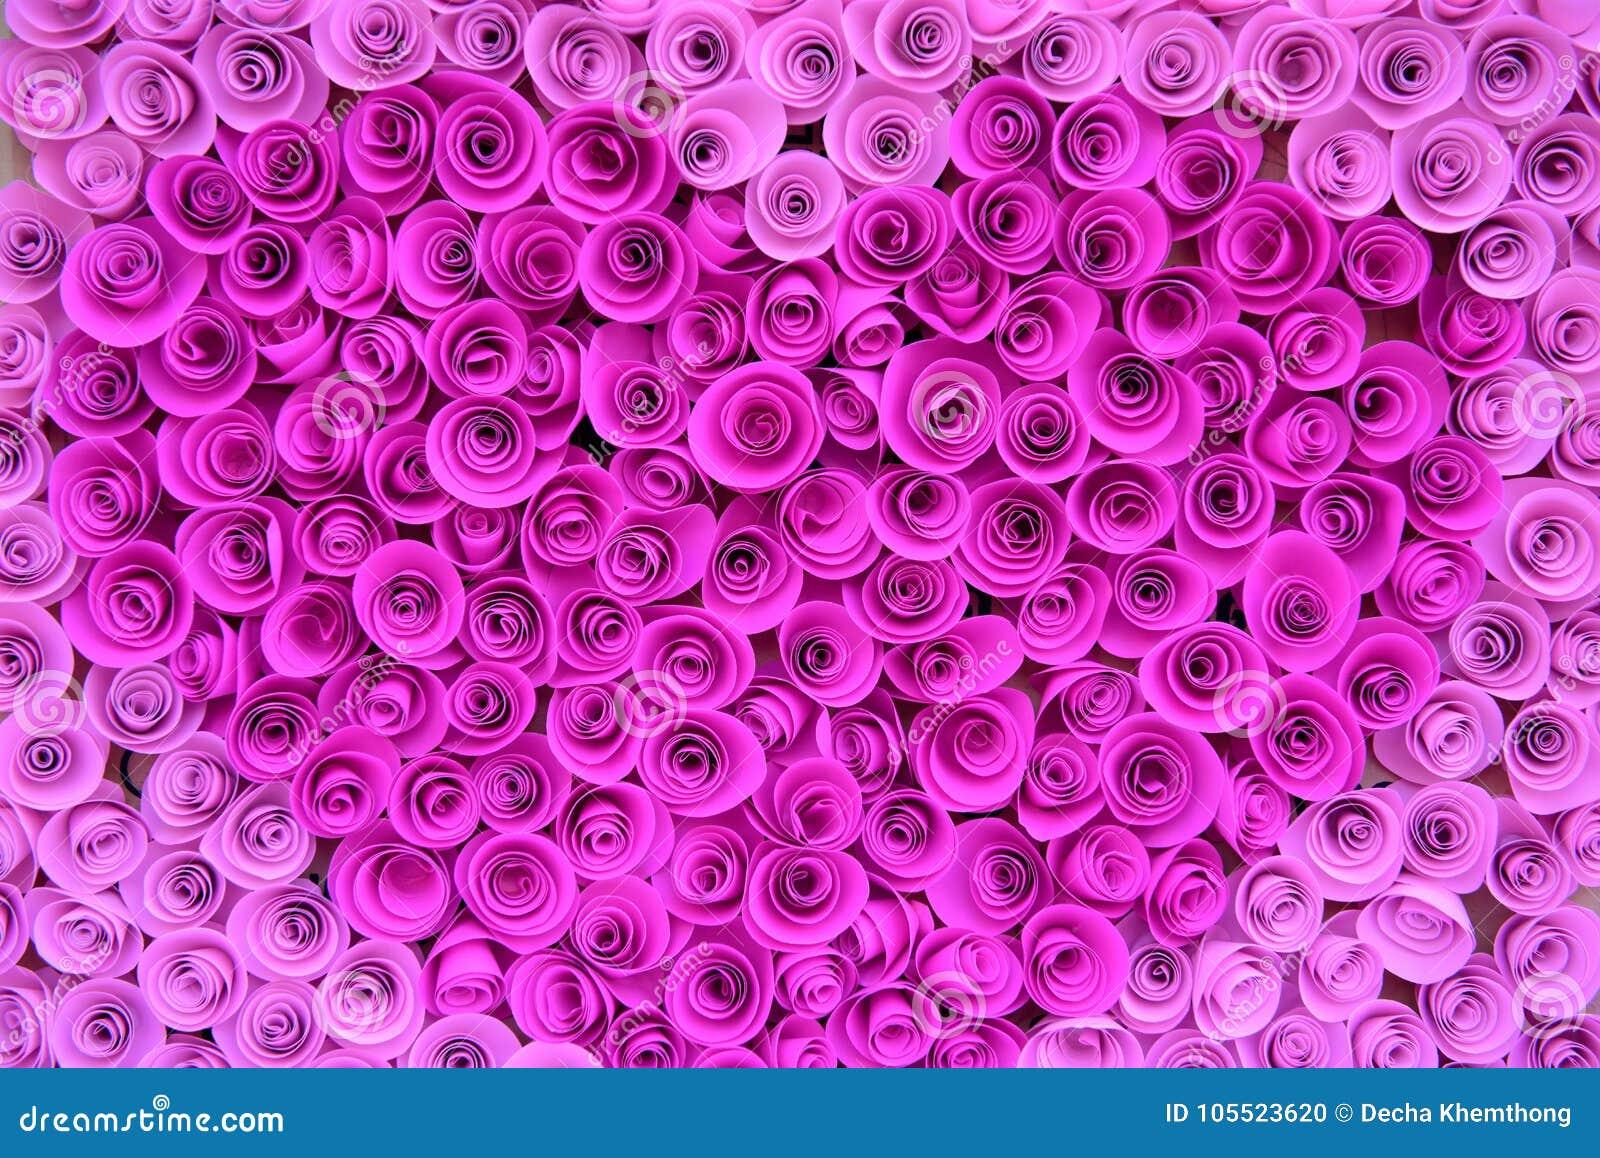 Velen behangen roze rozen